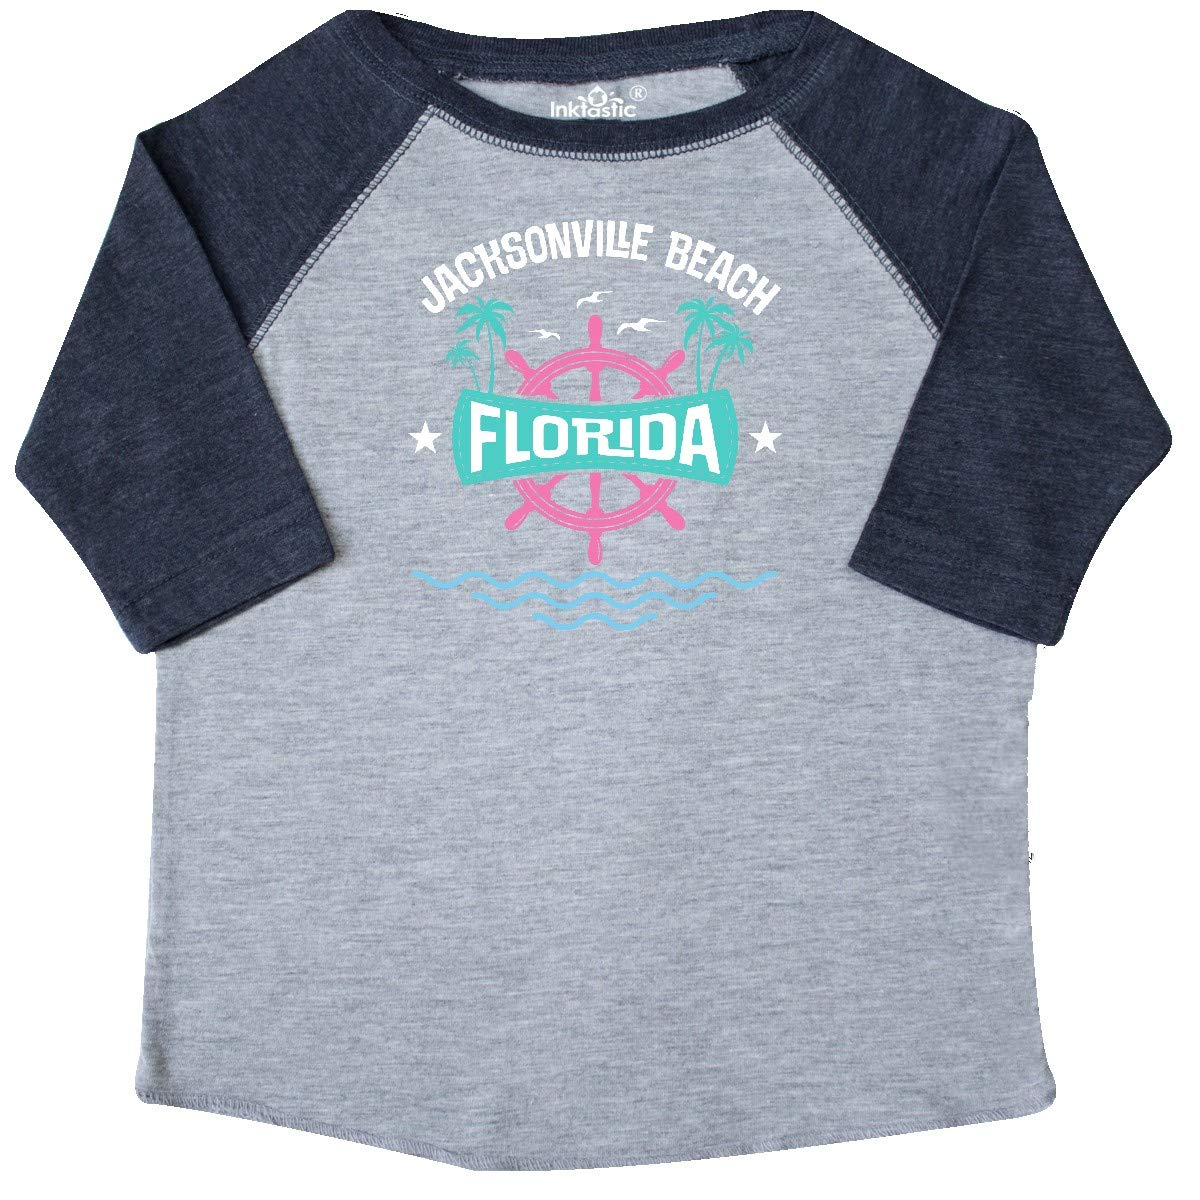 inktastic Jacksonville Beach Florida Vacation Toddler T-Shirt